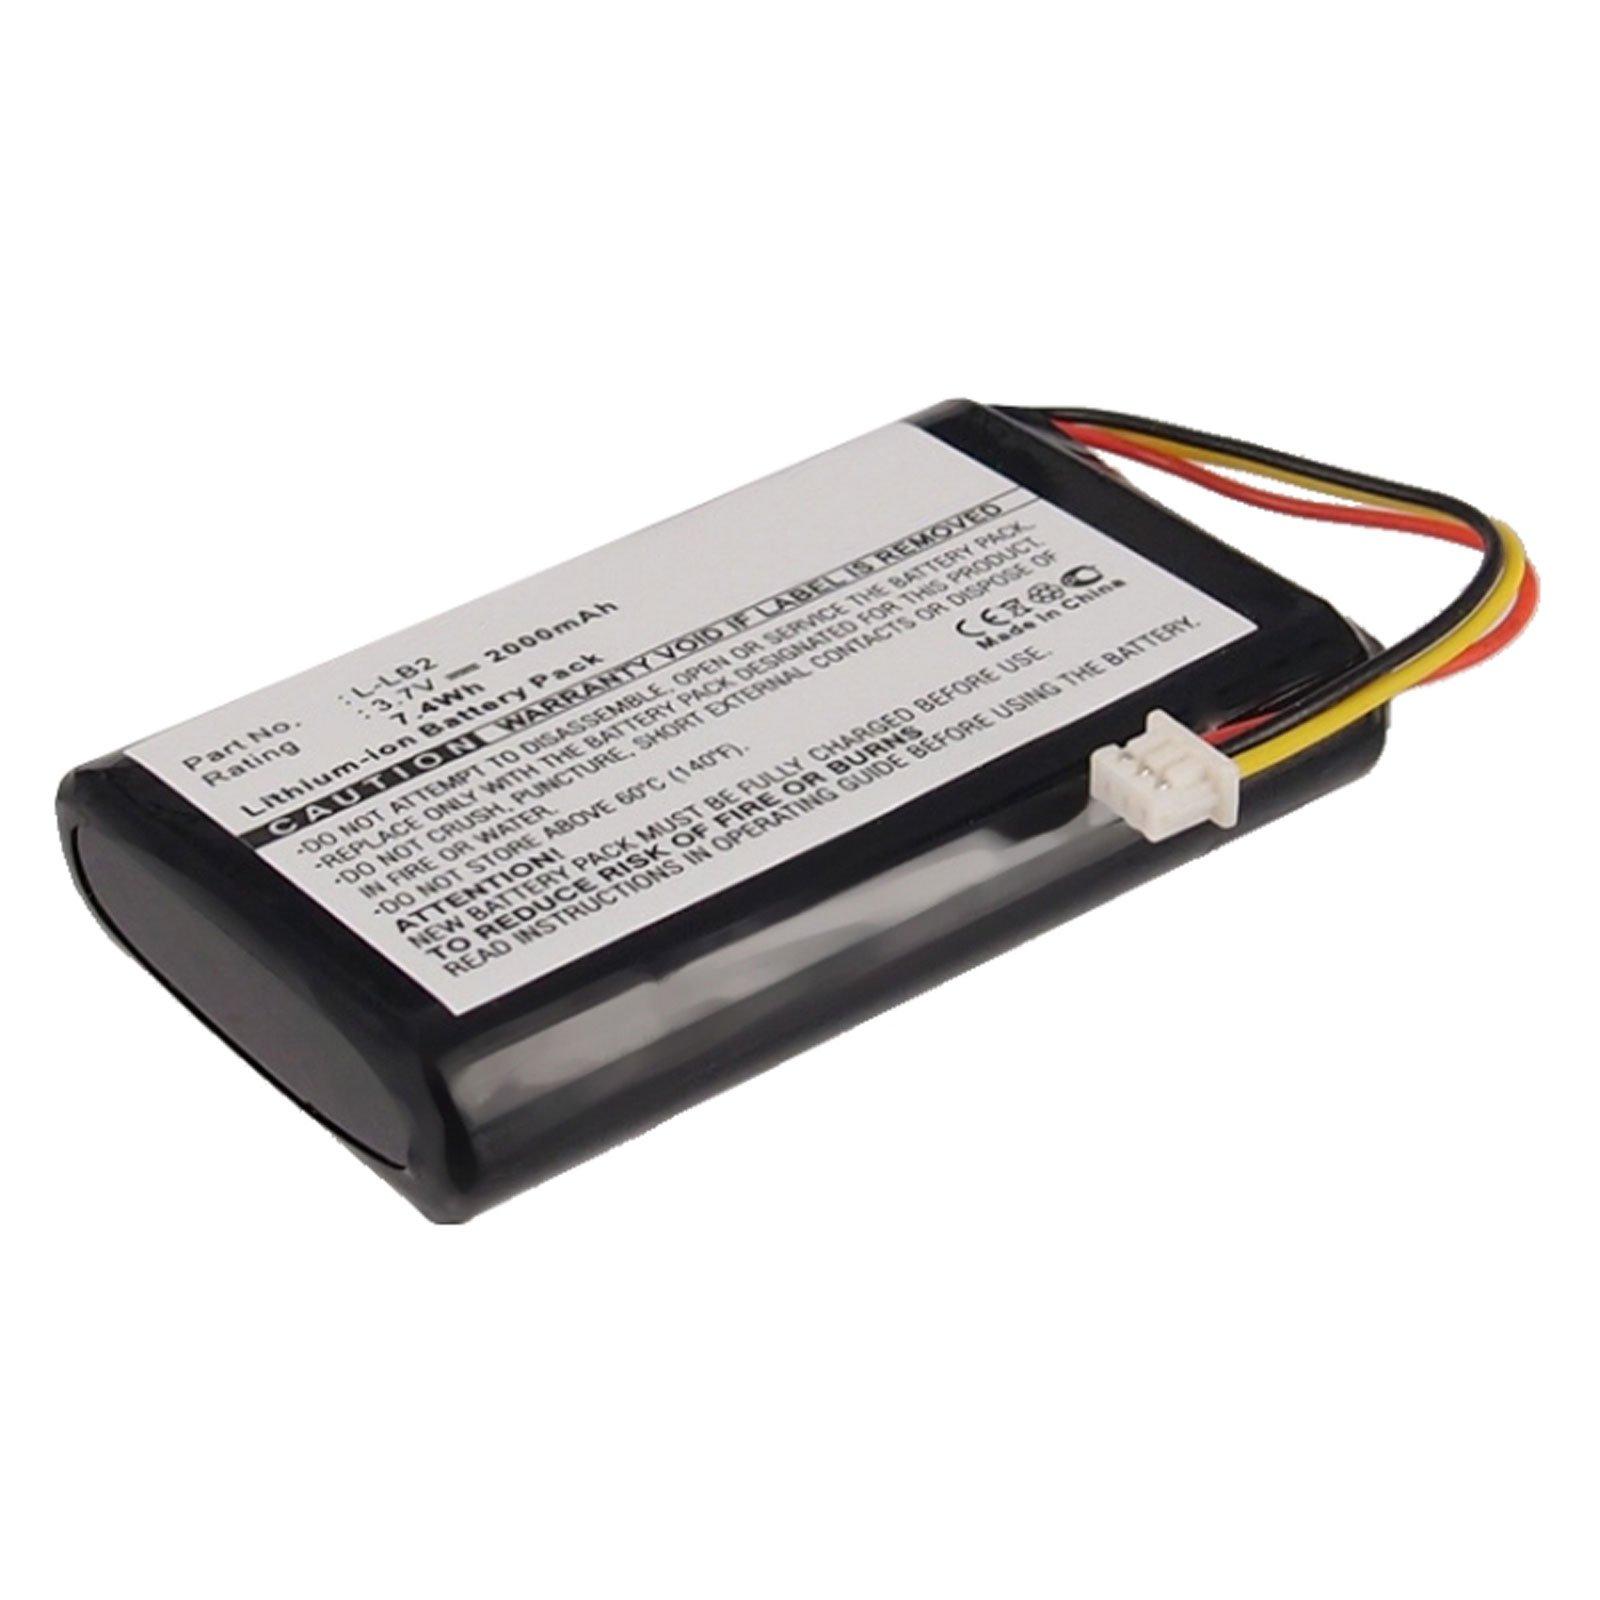 Exell Li-Ion Wireless Mouse Battery for Logitech MX1000 Computer Use Fits Logitech 190247-1000, Logitech L-LB2, Logitech M-RAG97, Logitech MX1000 cordless mouse